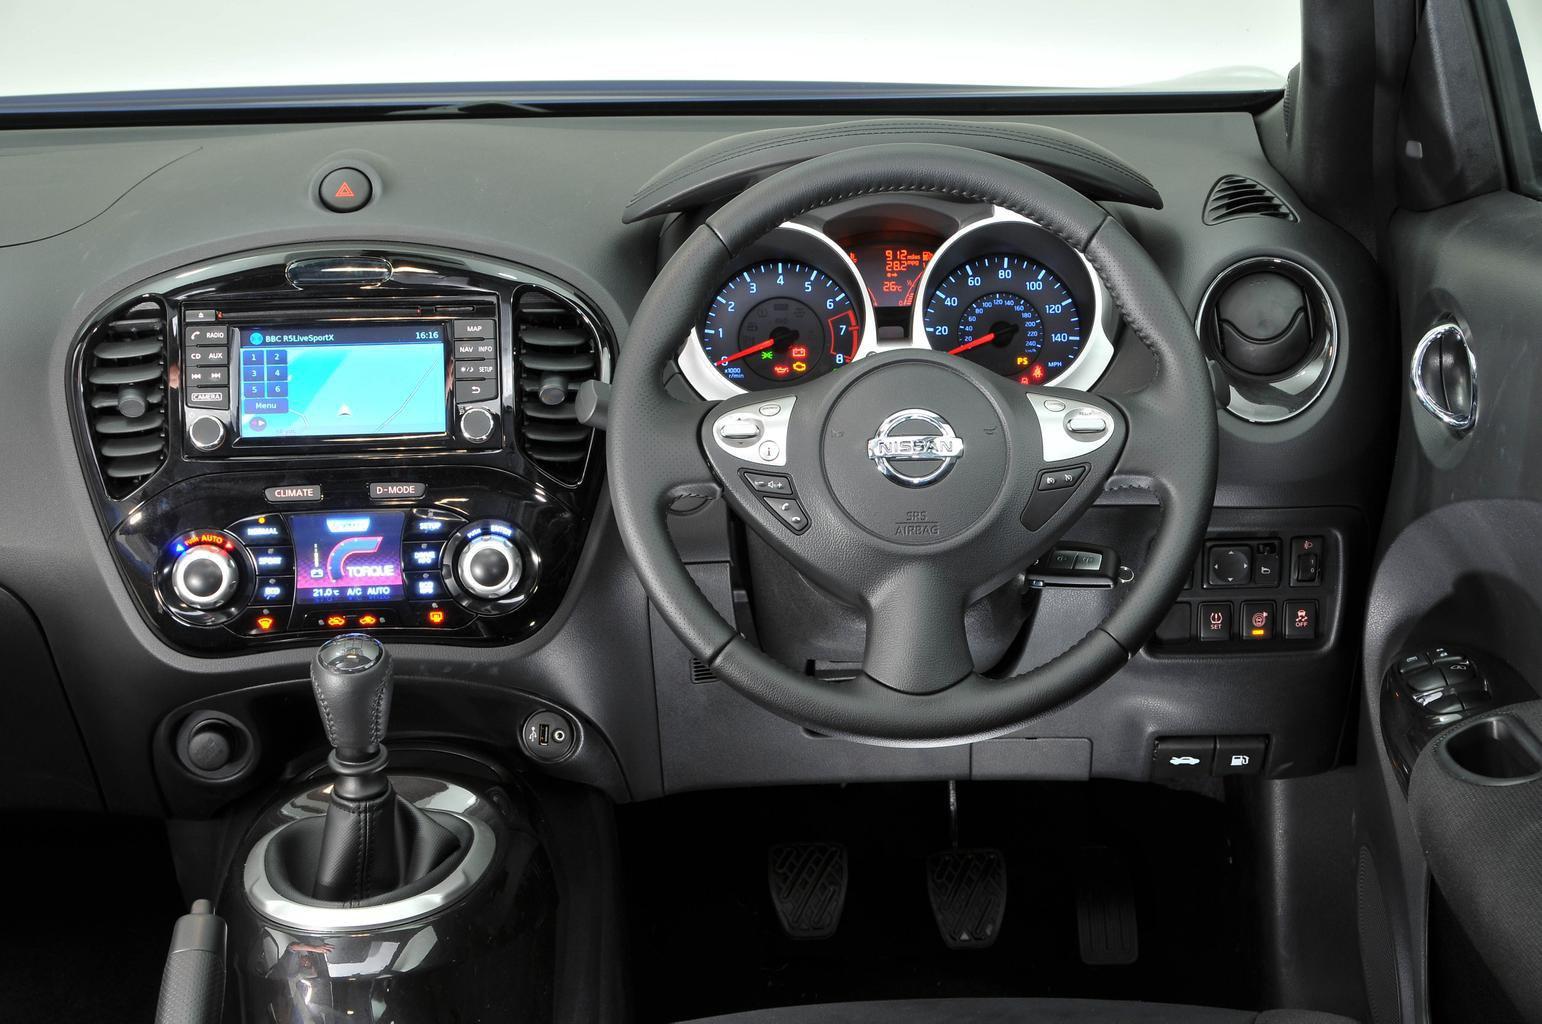 Nissan Juke 1.6 112 Acenta - interior